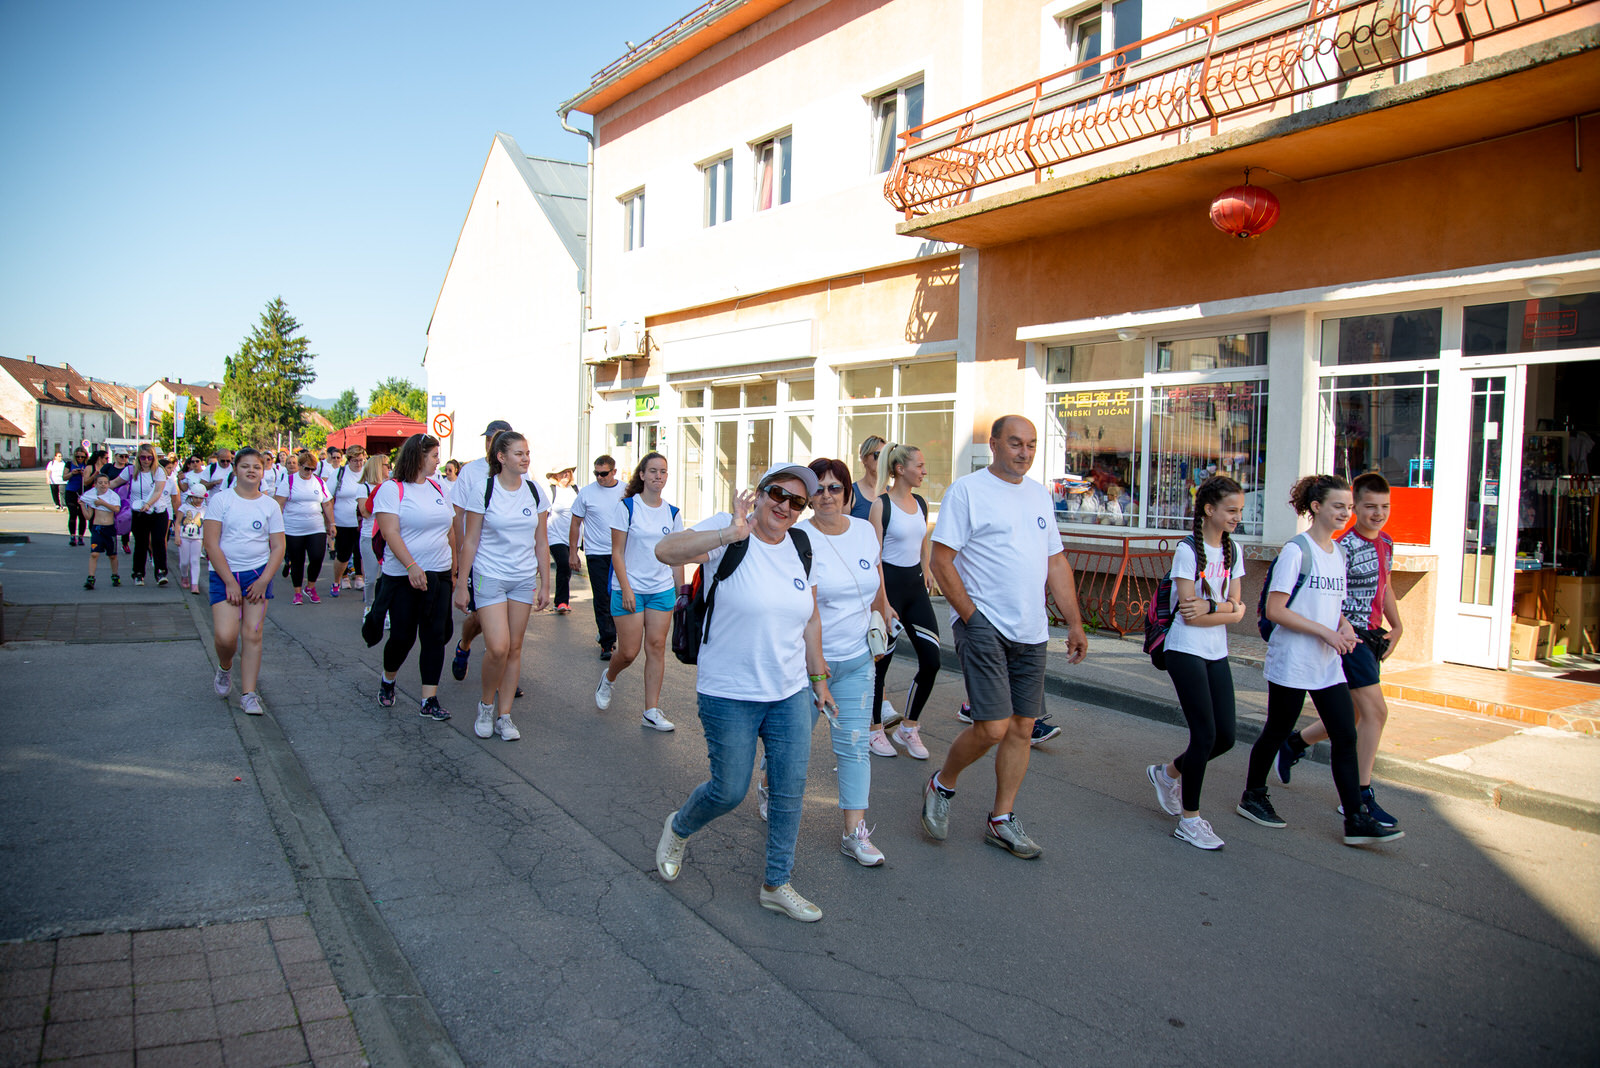 likaclub_gospić_hodanjem do zdravlja 2020 (29)